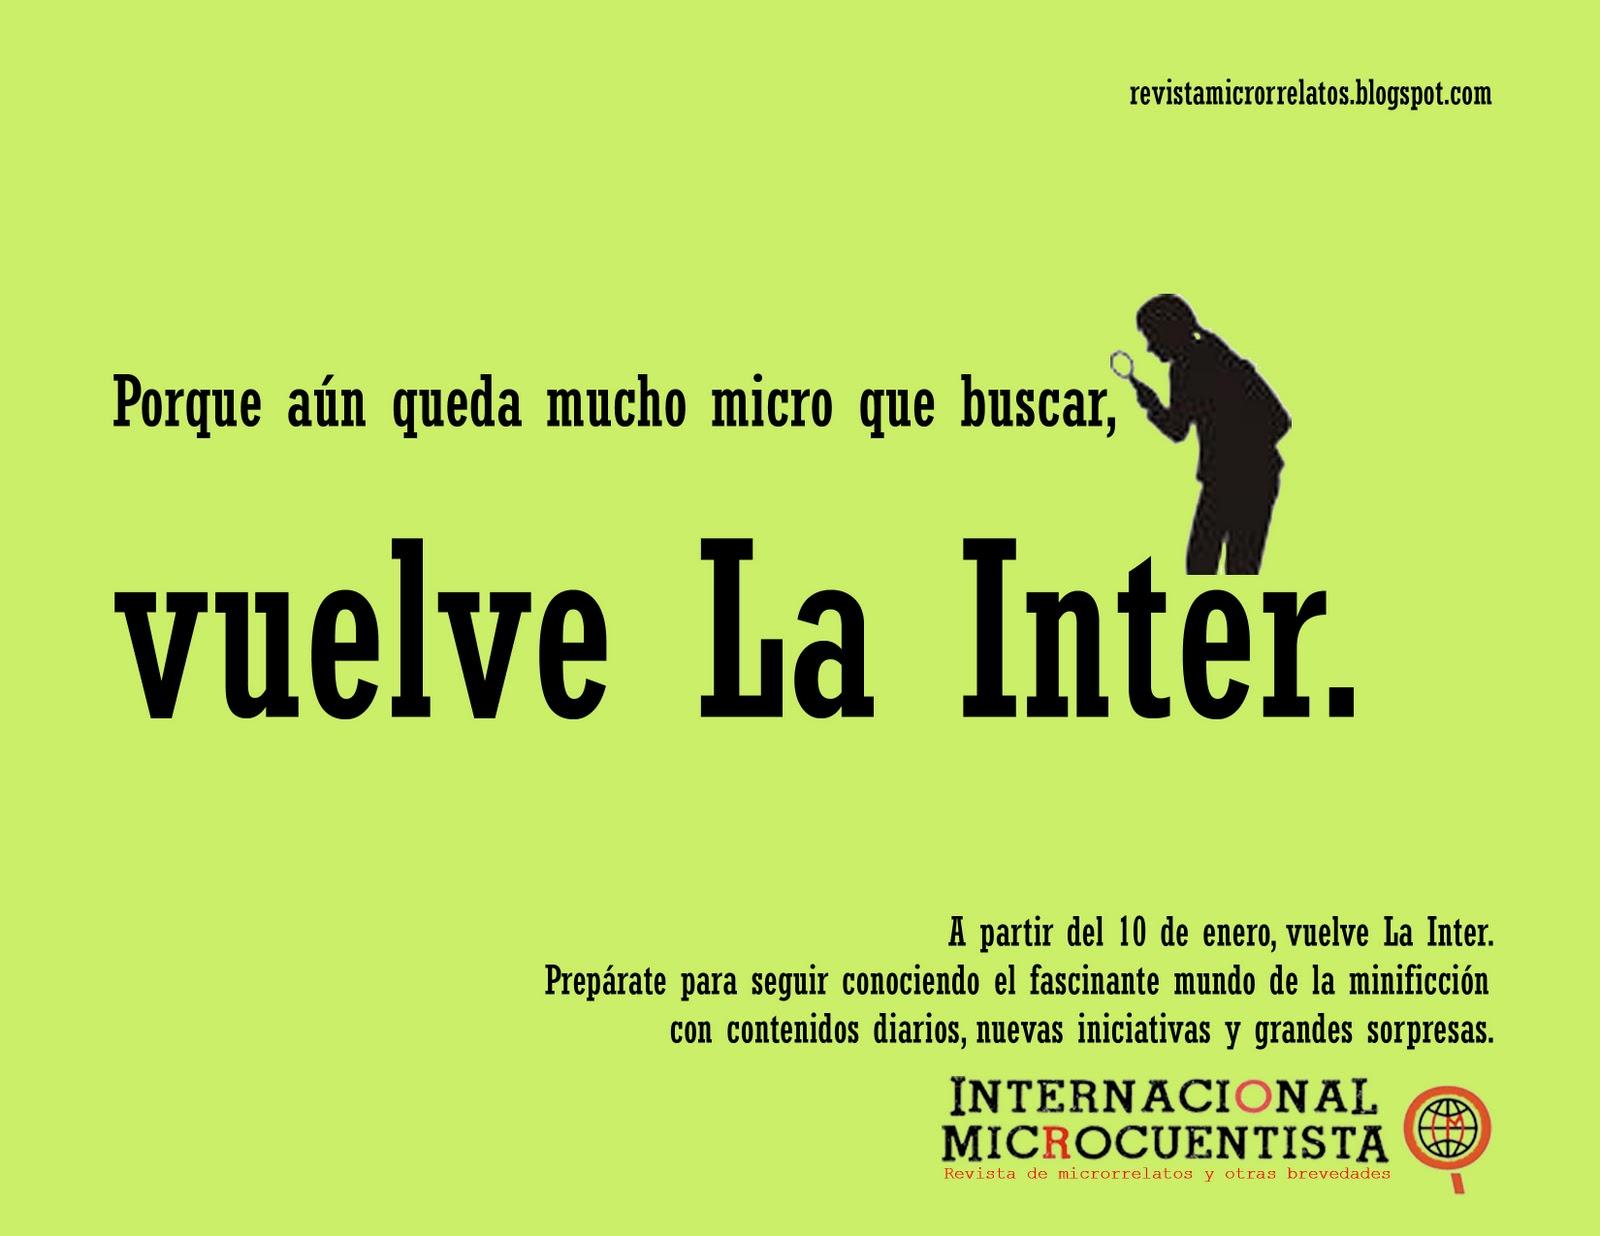 Internacional Microcuentista -: enero 2011